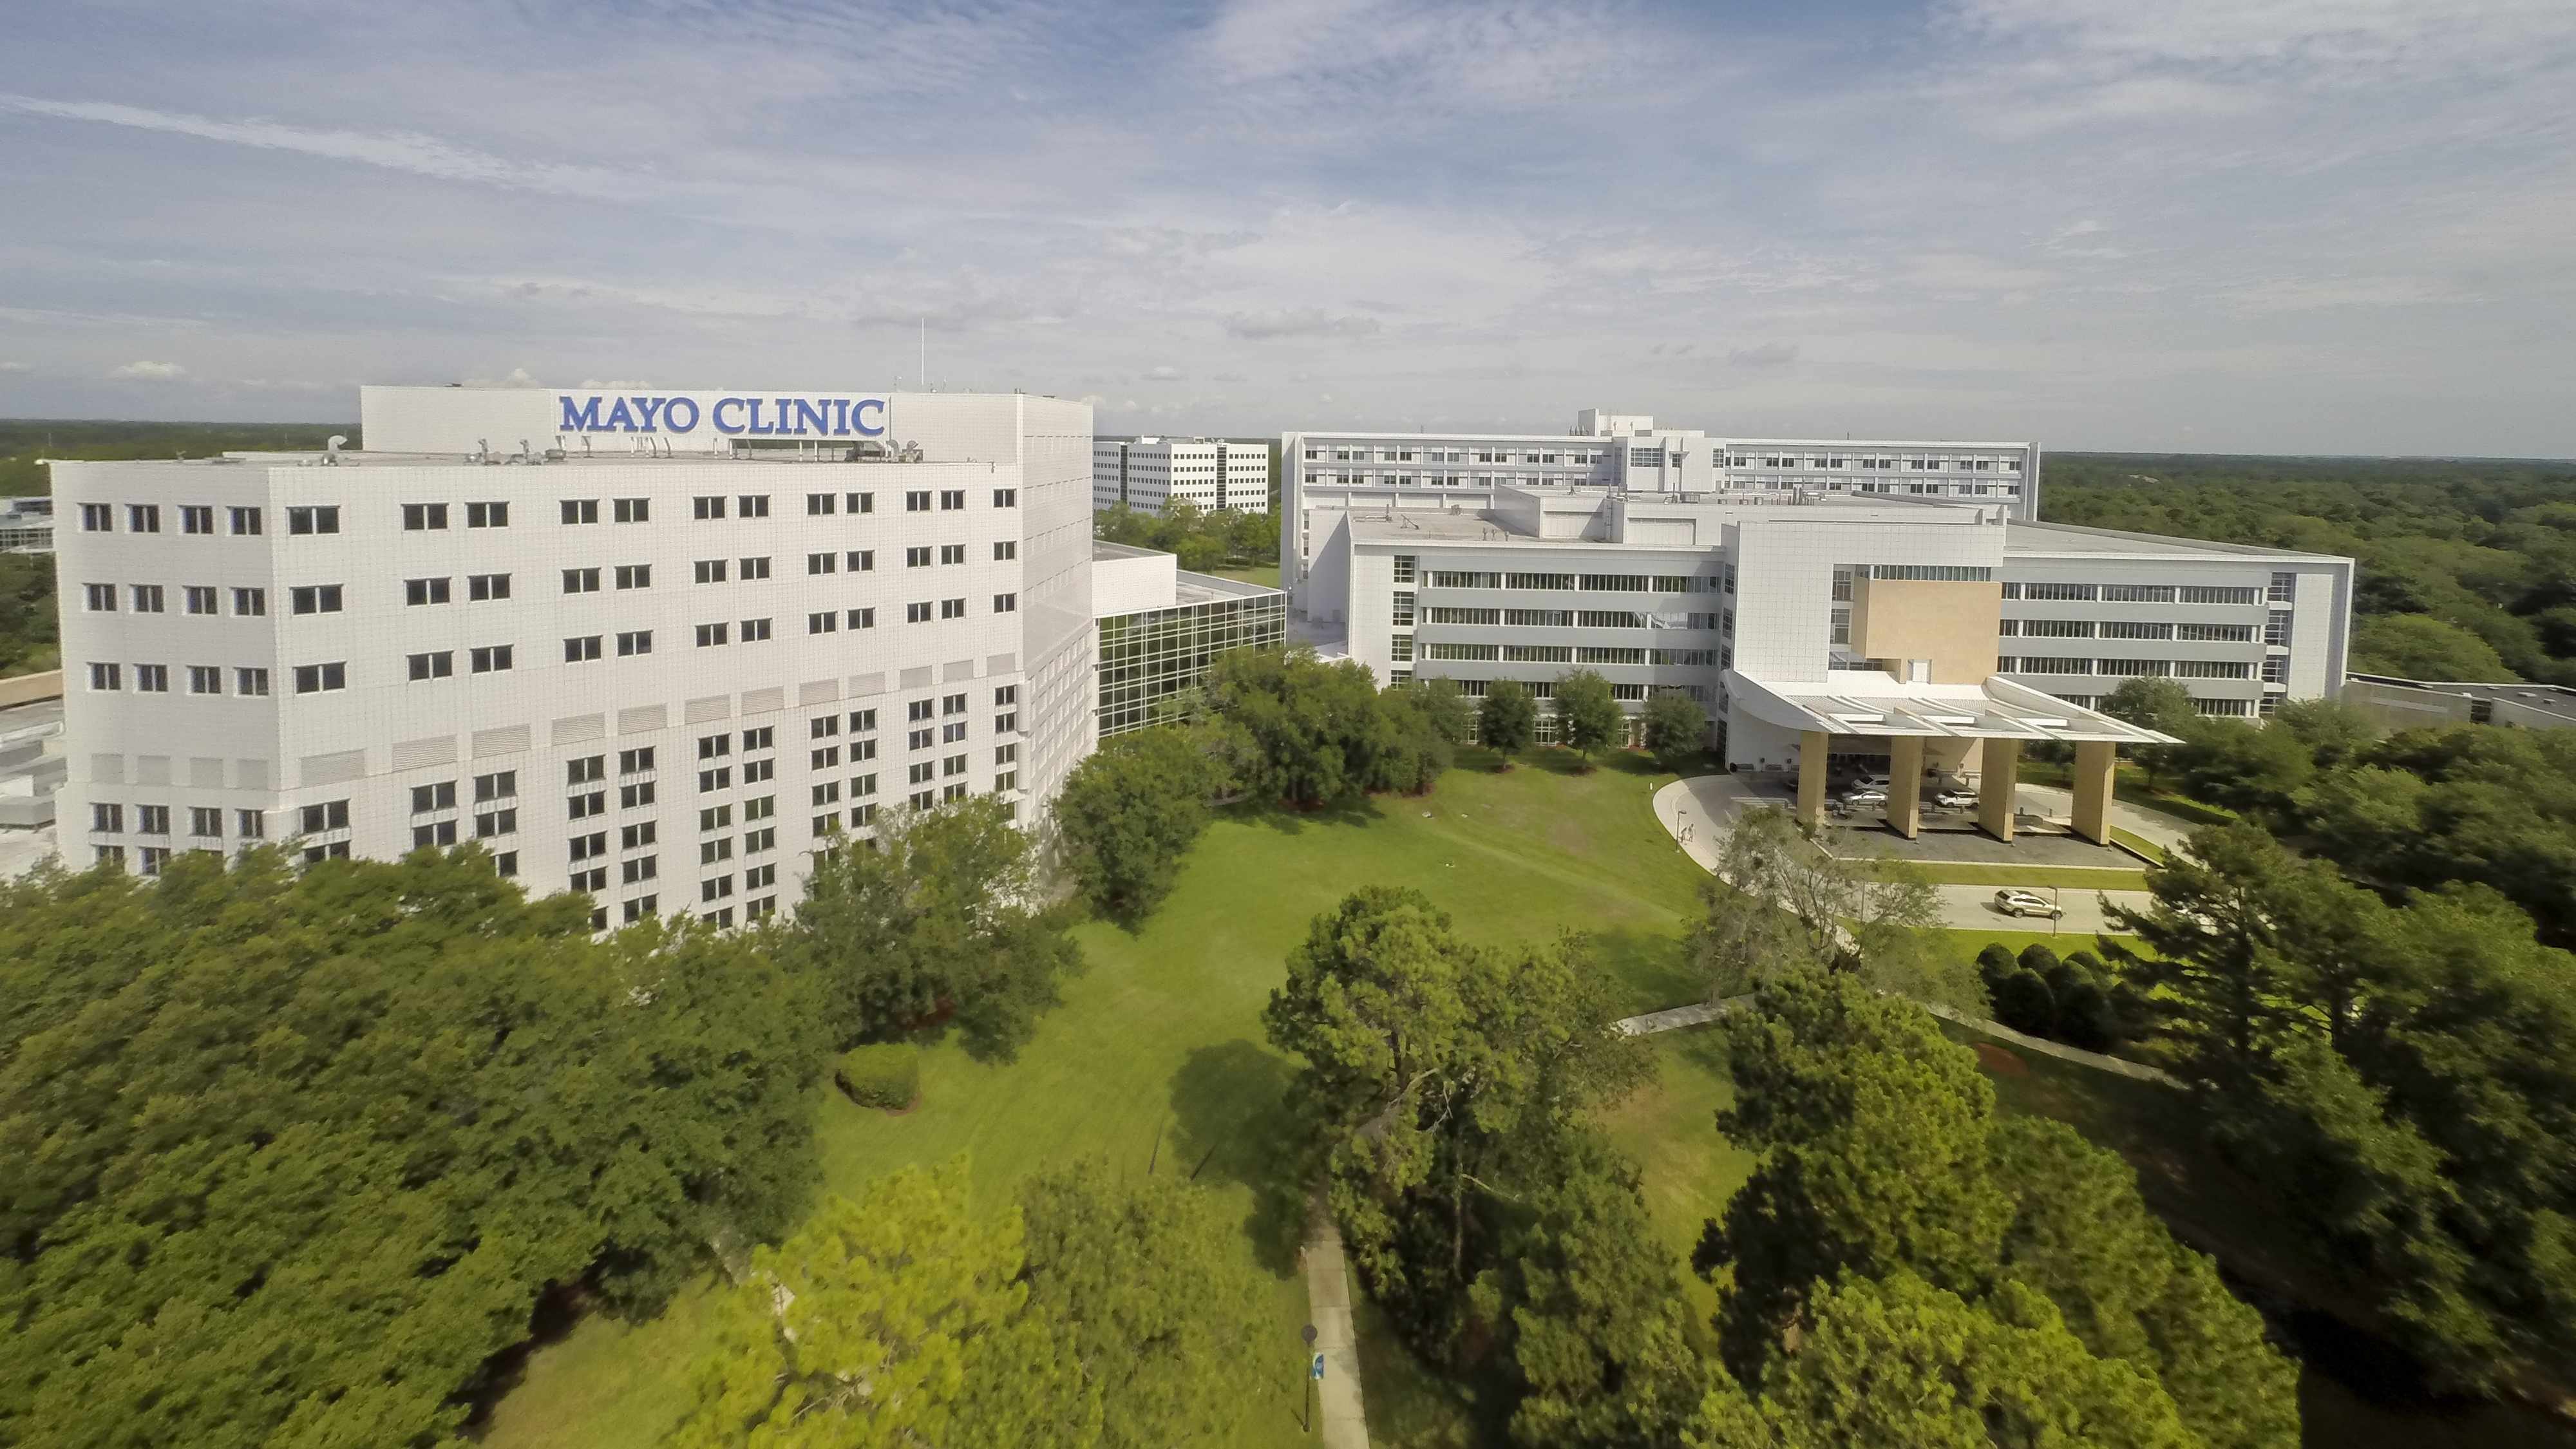 Mayo Clinic Campus Florida